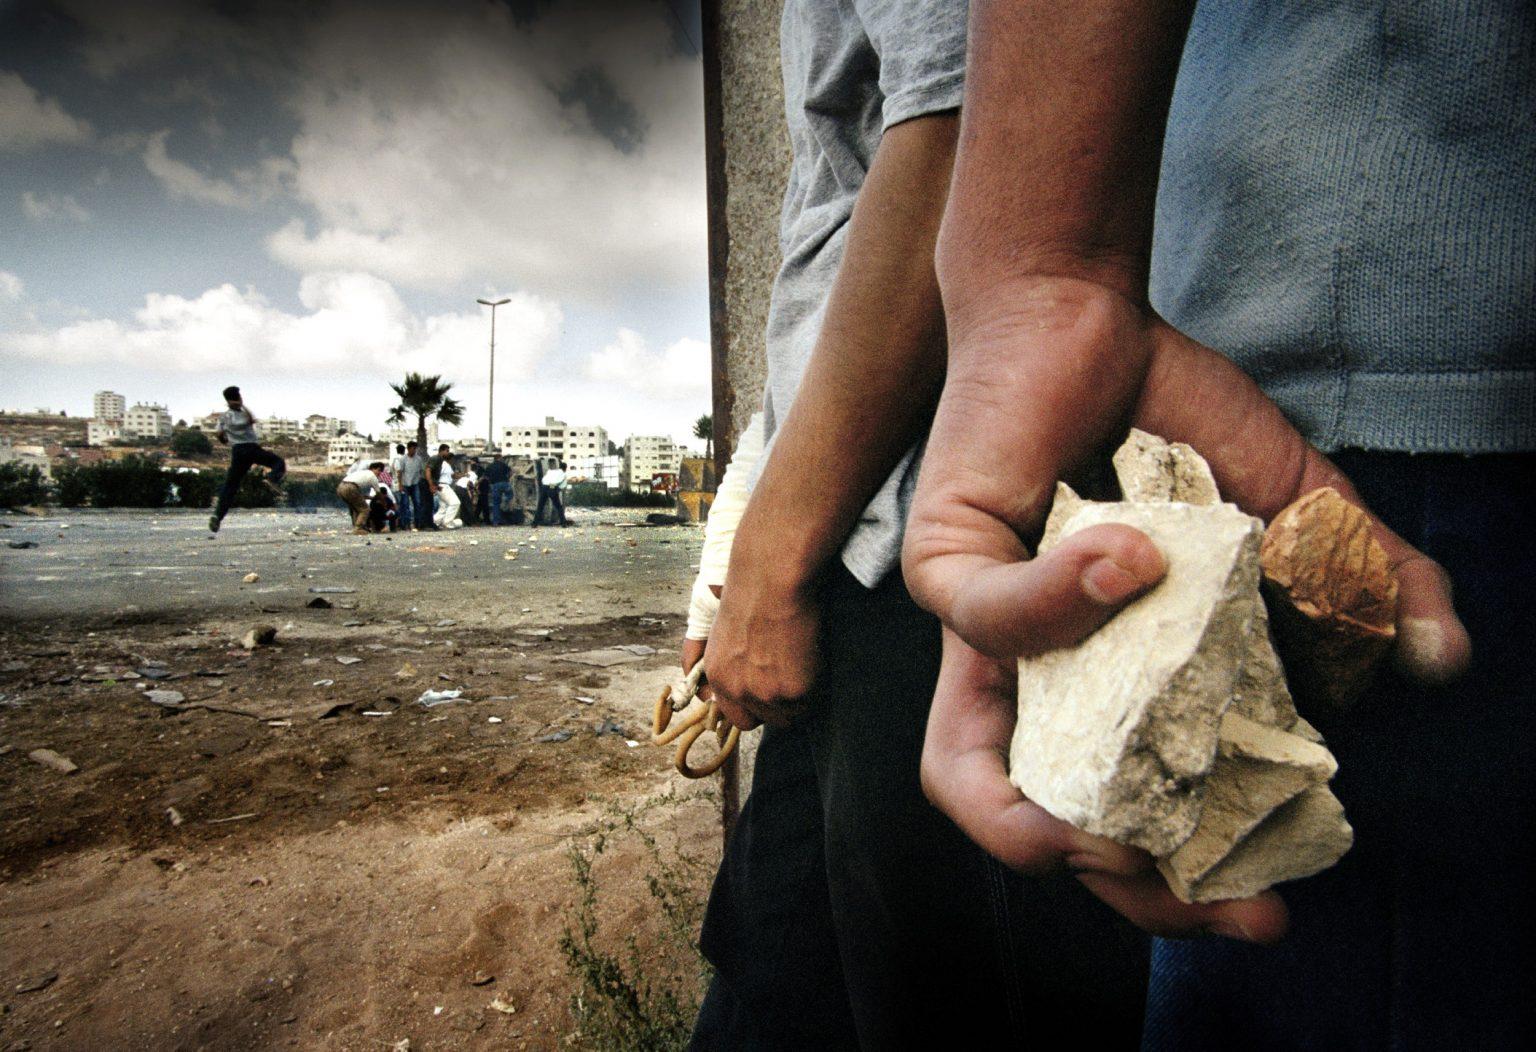 intifada-ramallah-west-bank-2000intifada-ramallah-cisgiordania-2000